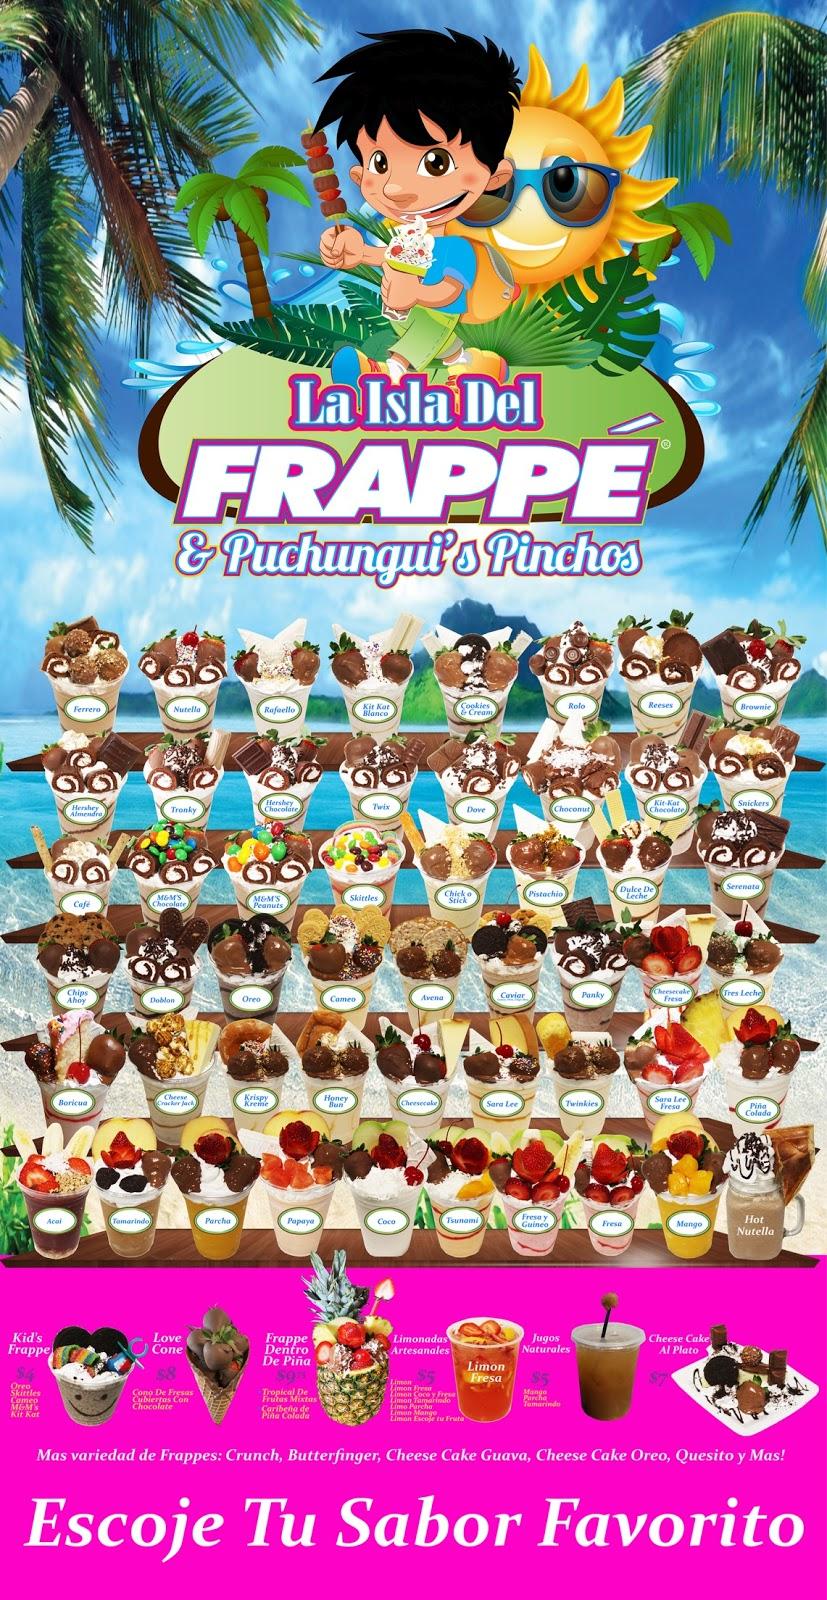 La Isla Del Frappe & Puchunguis Pinchos - restaurant  | Photo 8 of 10 | Address: 7401 E Colonial Dr, Orlando, FL 32807, USA | Phone: (407) 300-2196